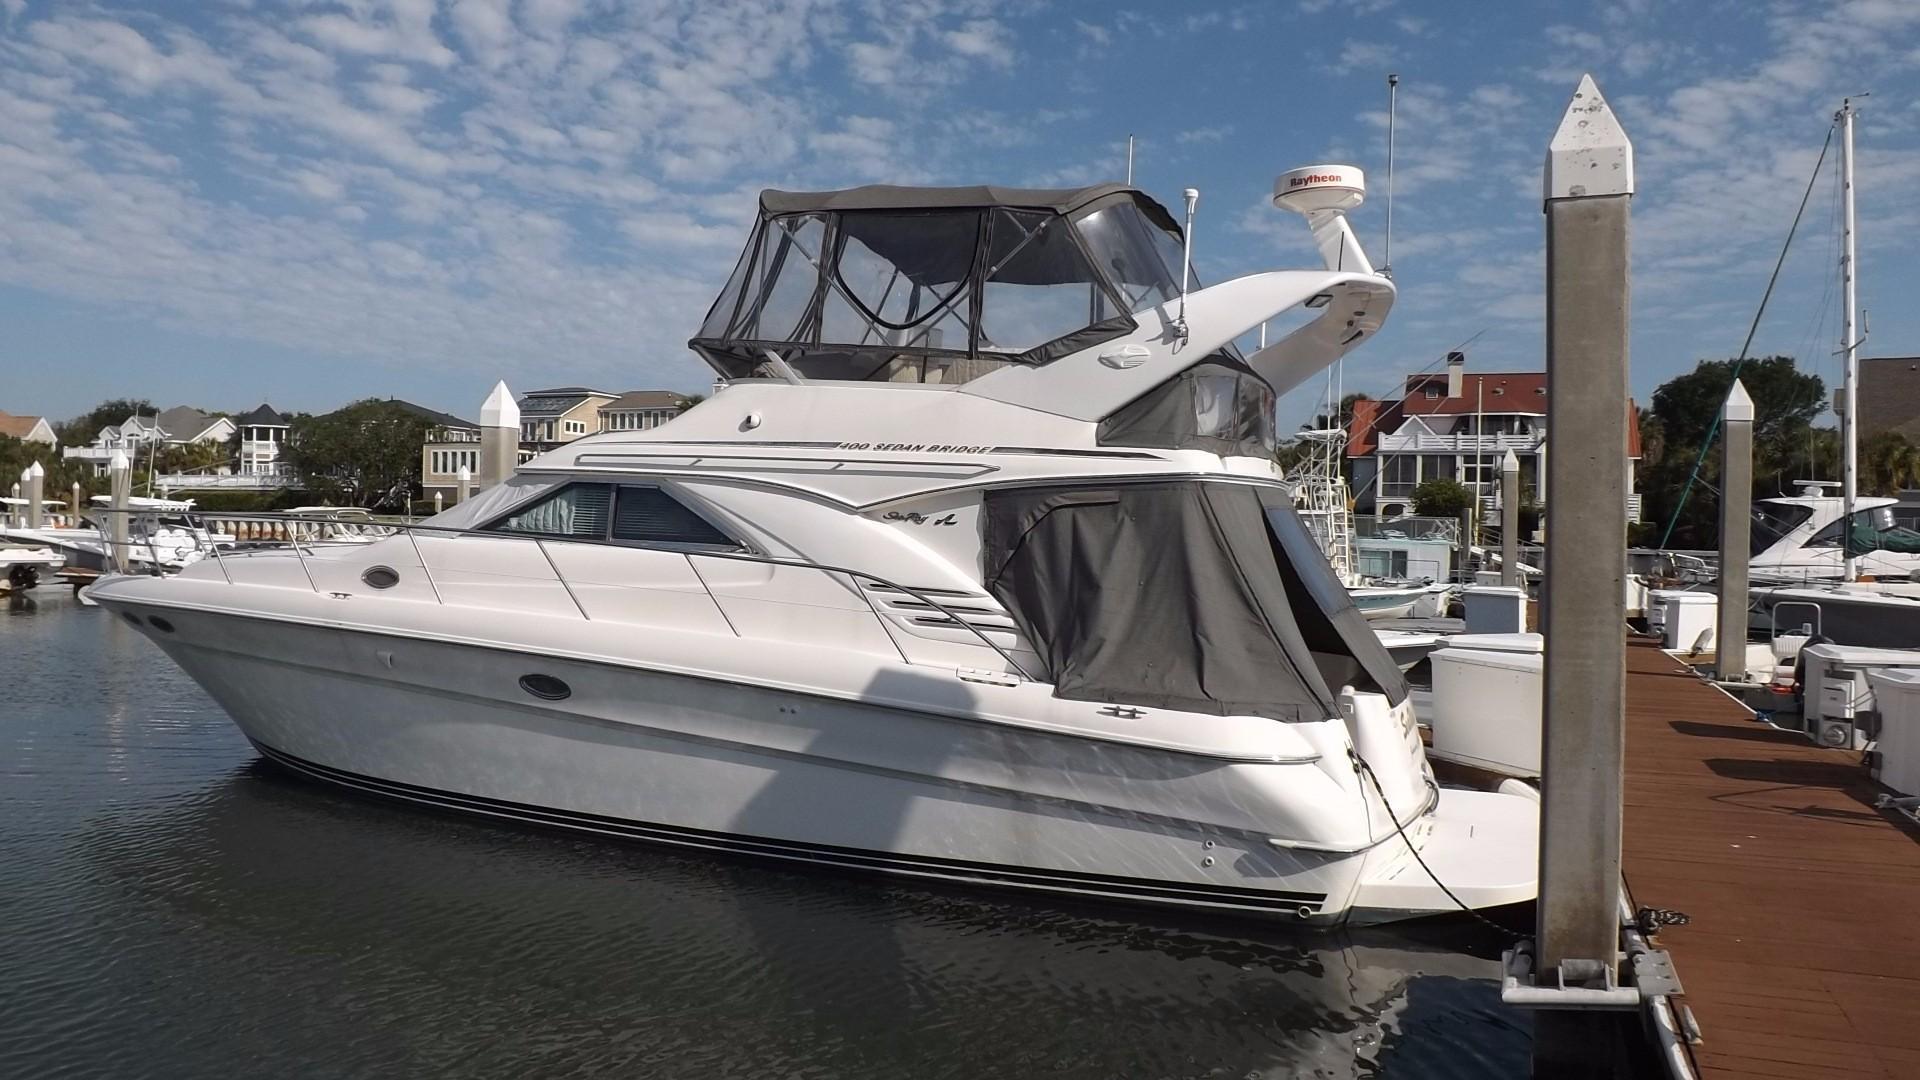 1997 sea ray 400 sedan bridge power boat for sale www yachtworld com rh yachtworld com Sea Ray Boat Wiring Diagrams 1985 Sea Ray Seville Specifications